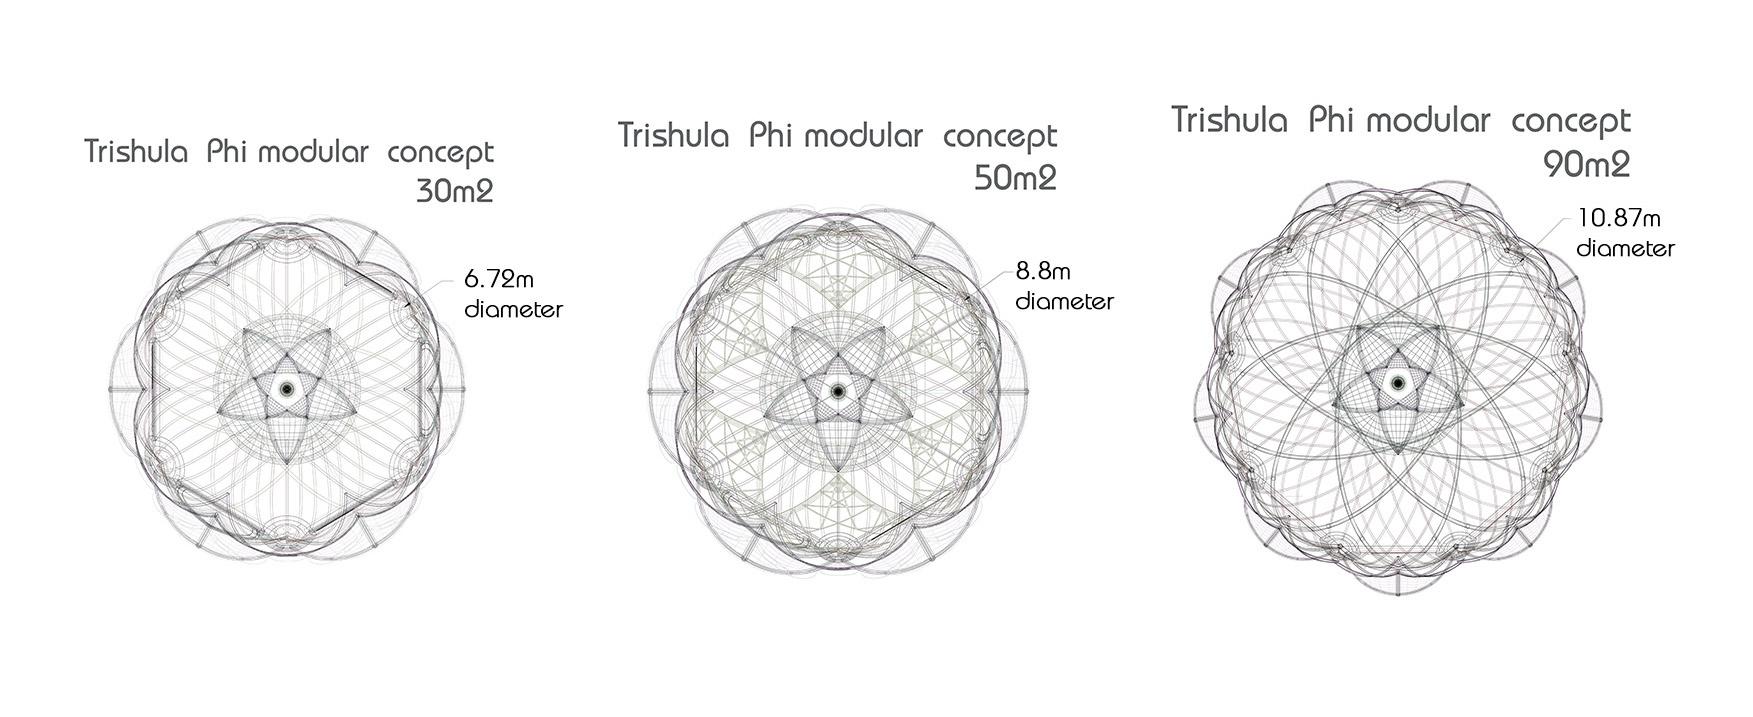 presentation THE 3 TRISHULAS 8.jpg